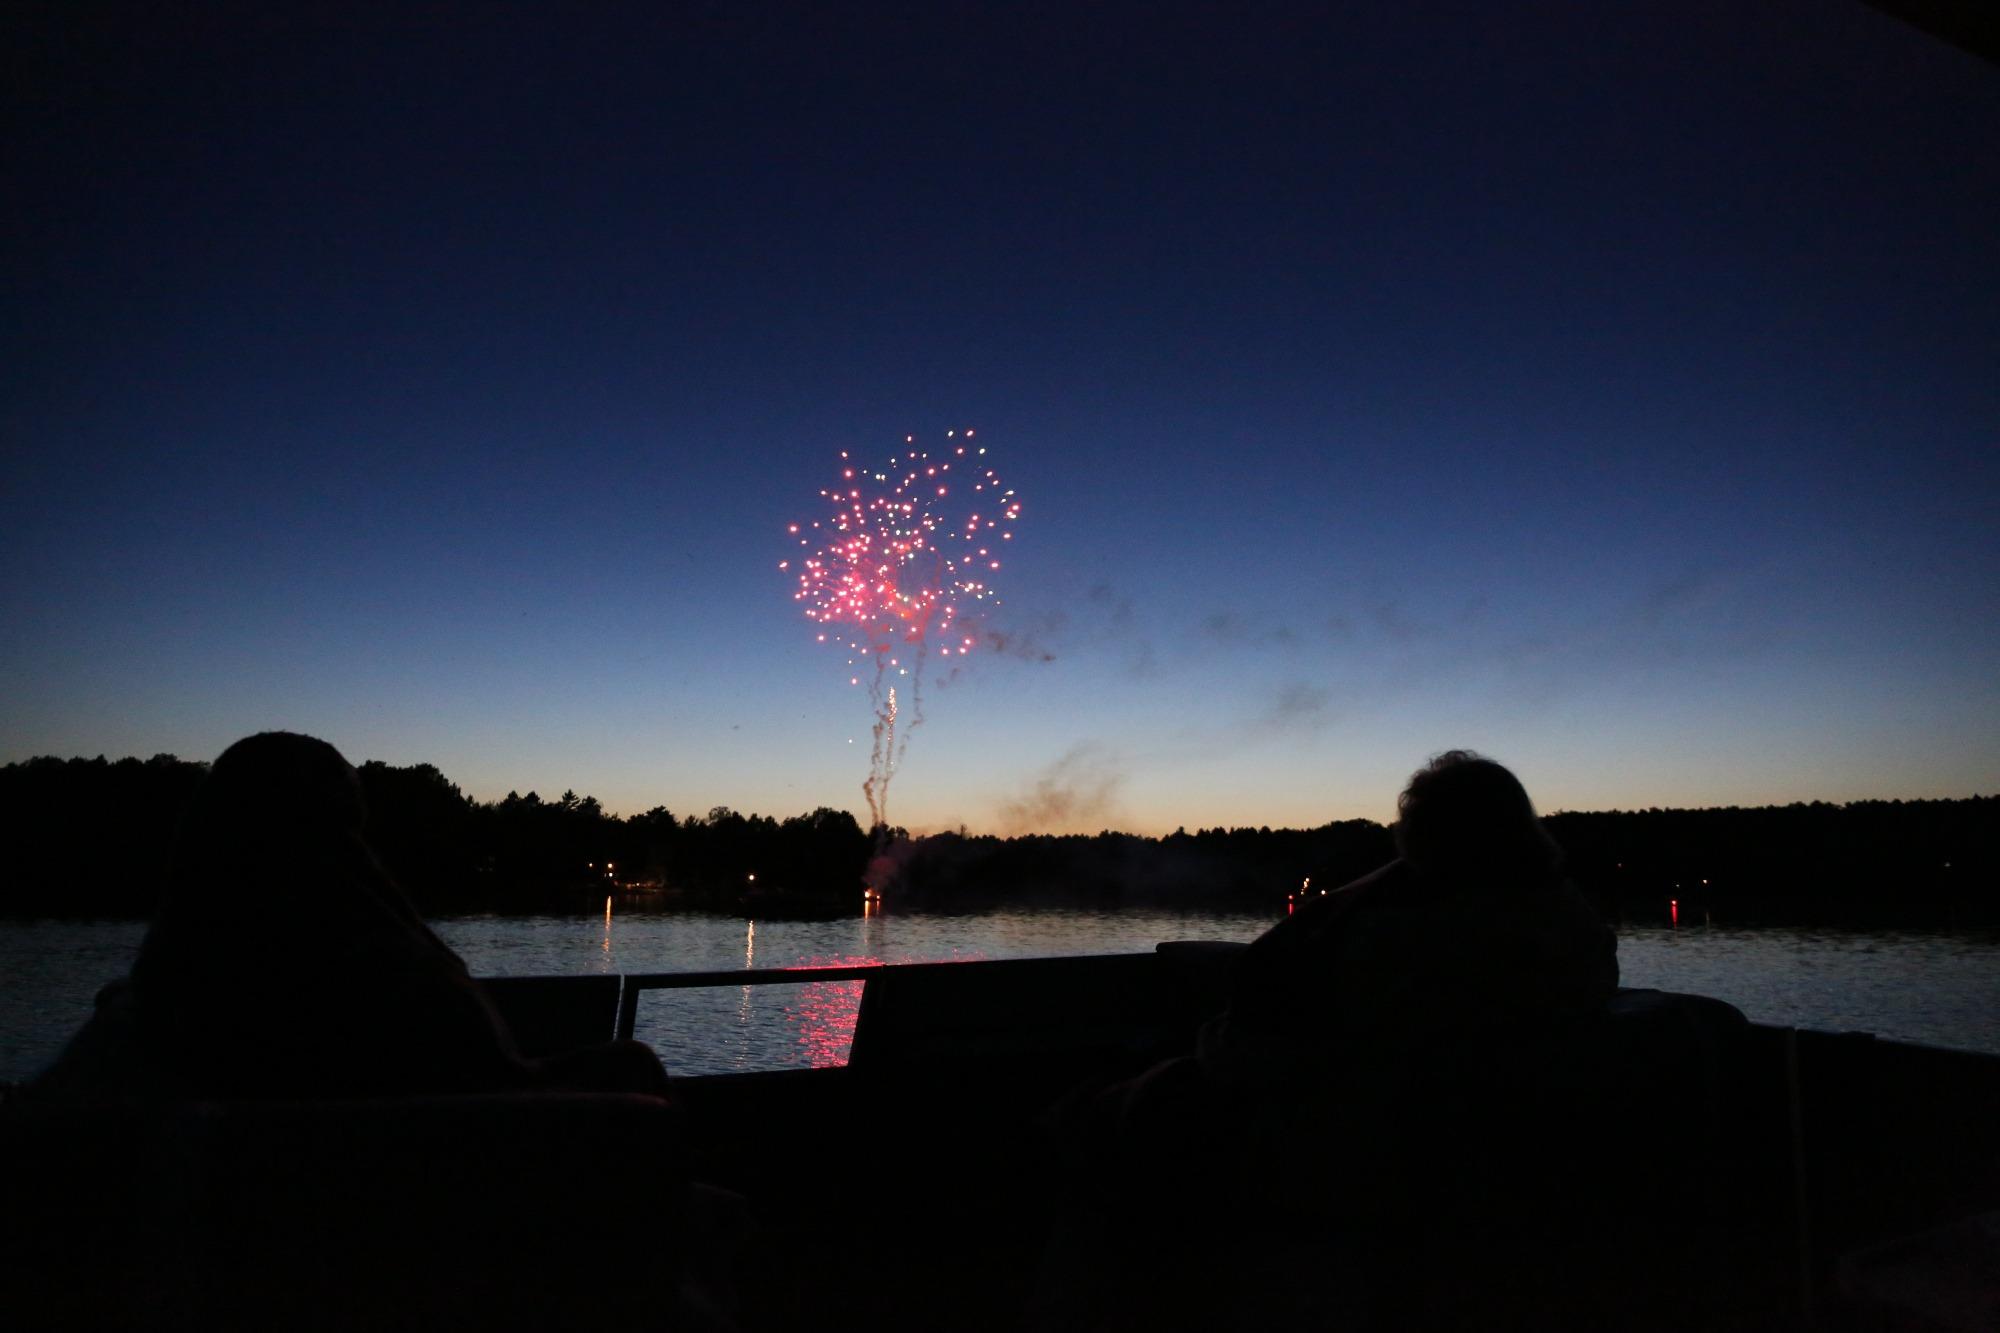 fireworks over lake oneida county wi